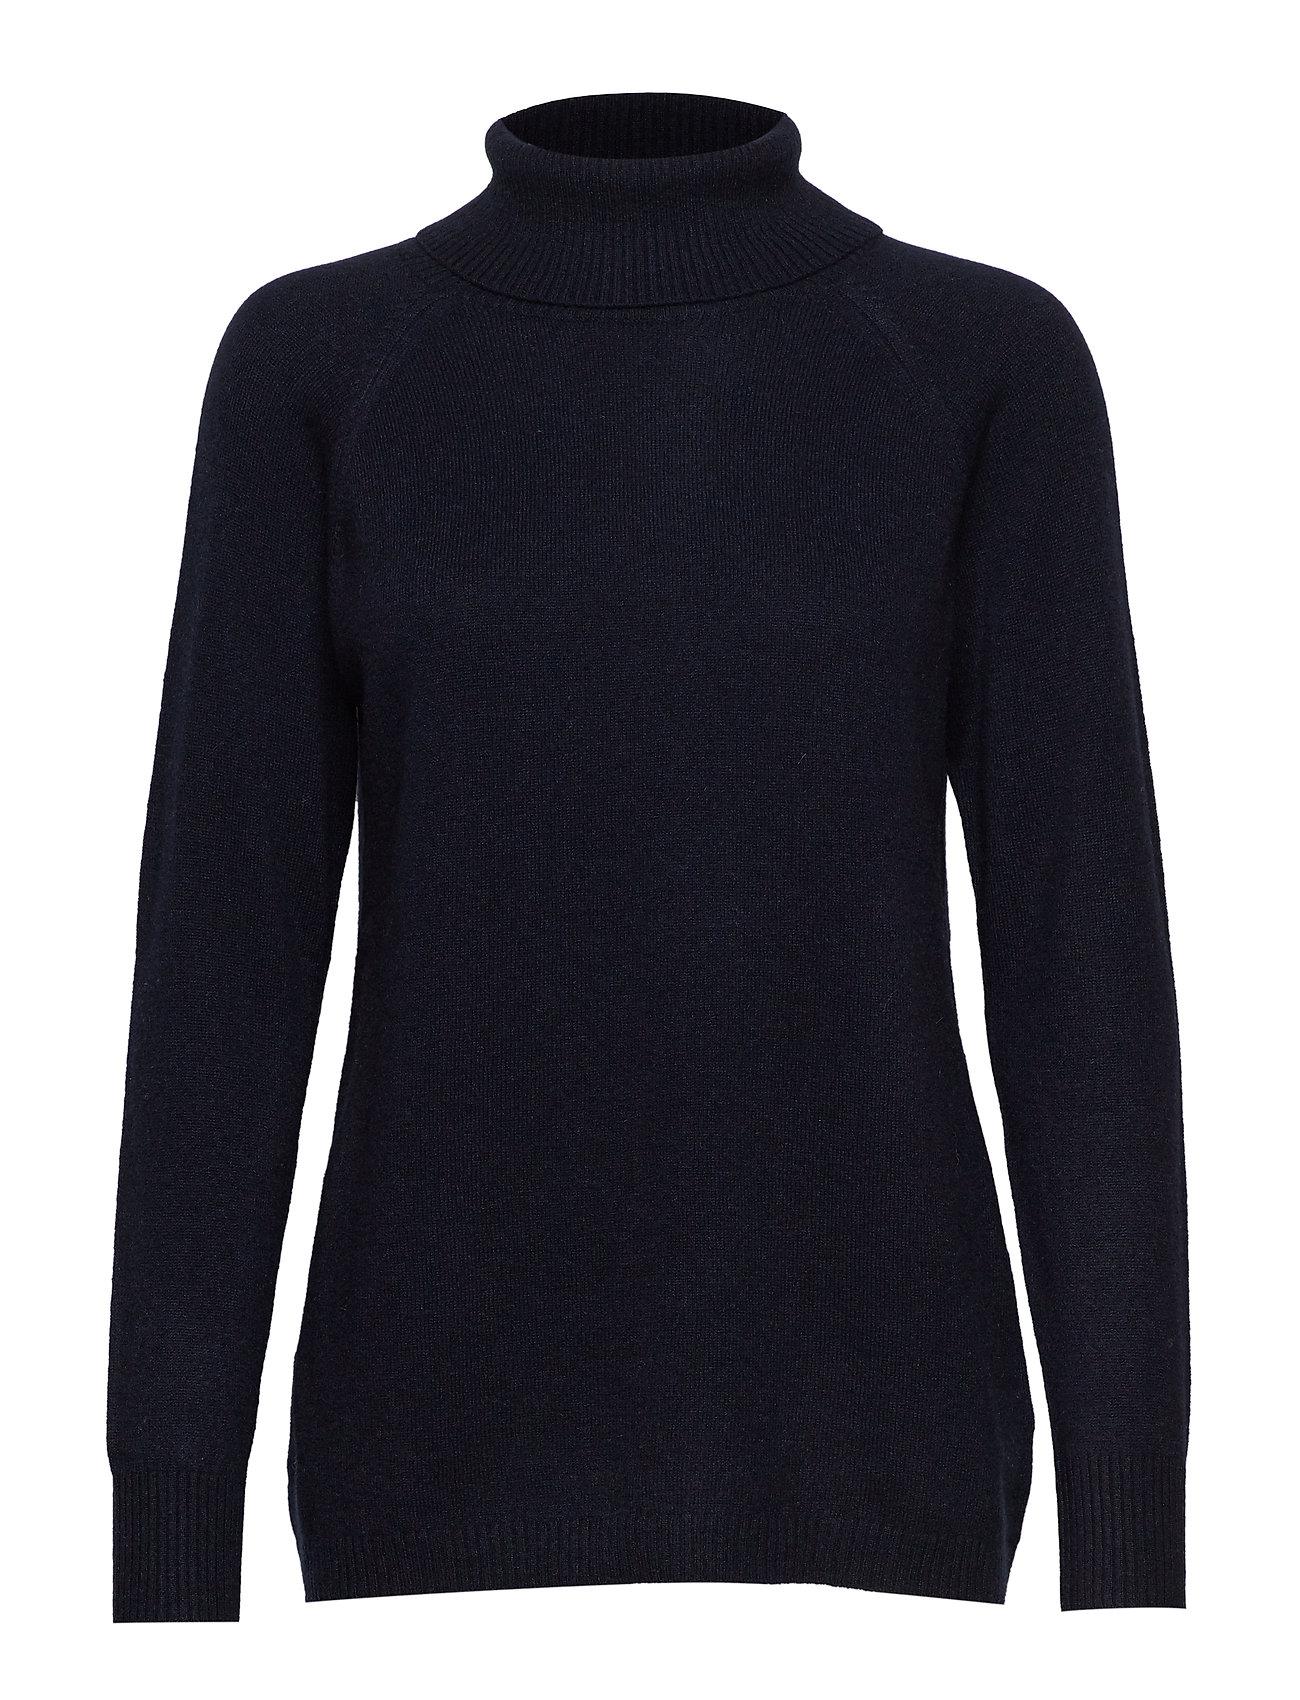 Davida Cashmere Raglan Turtleneck Loose Sweater - NAVY